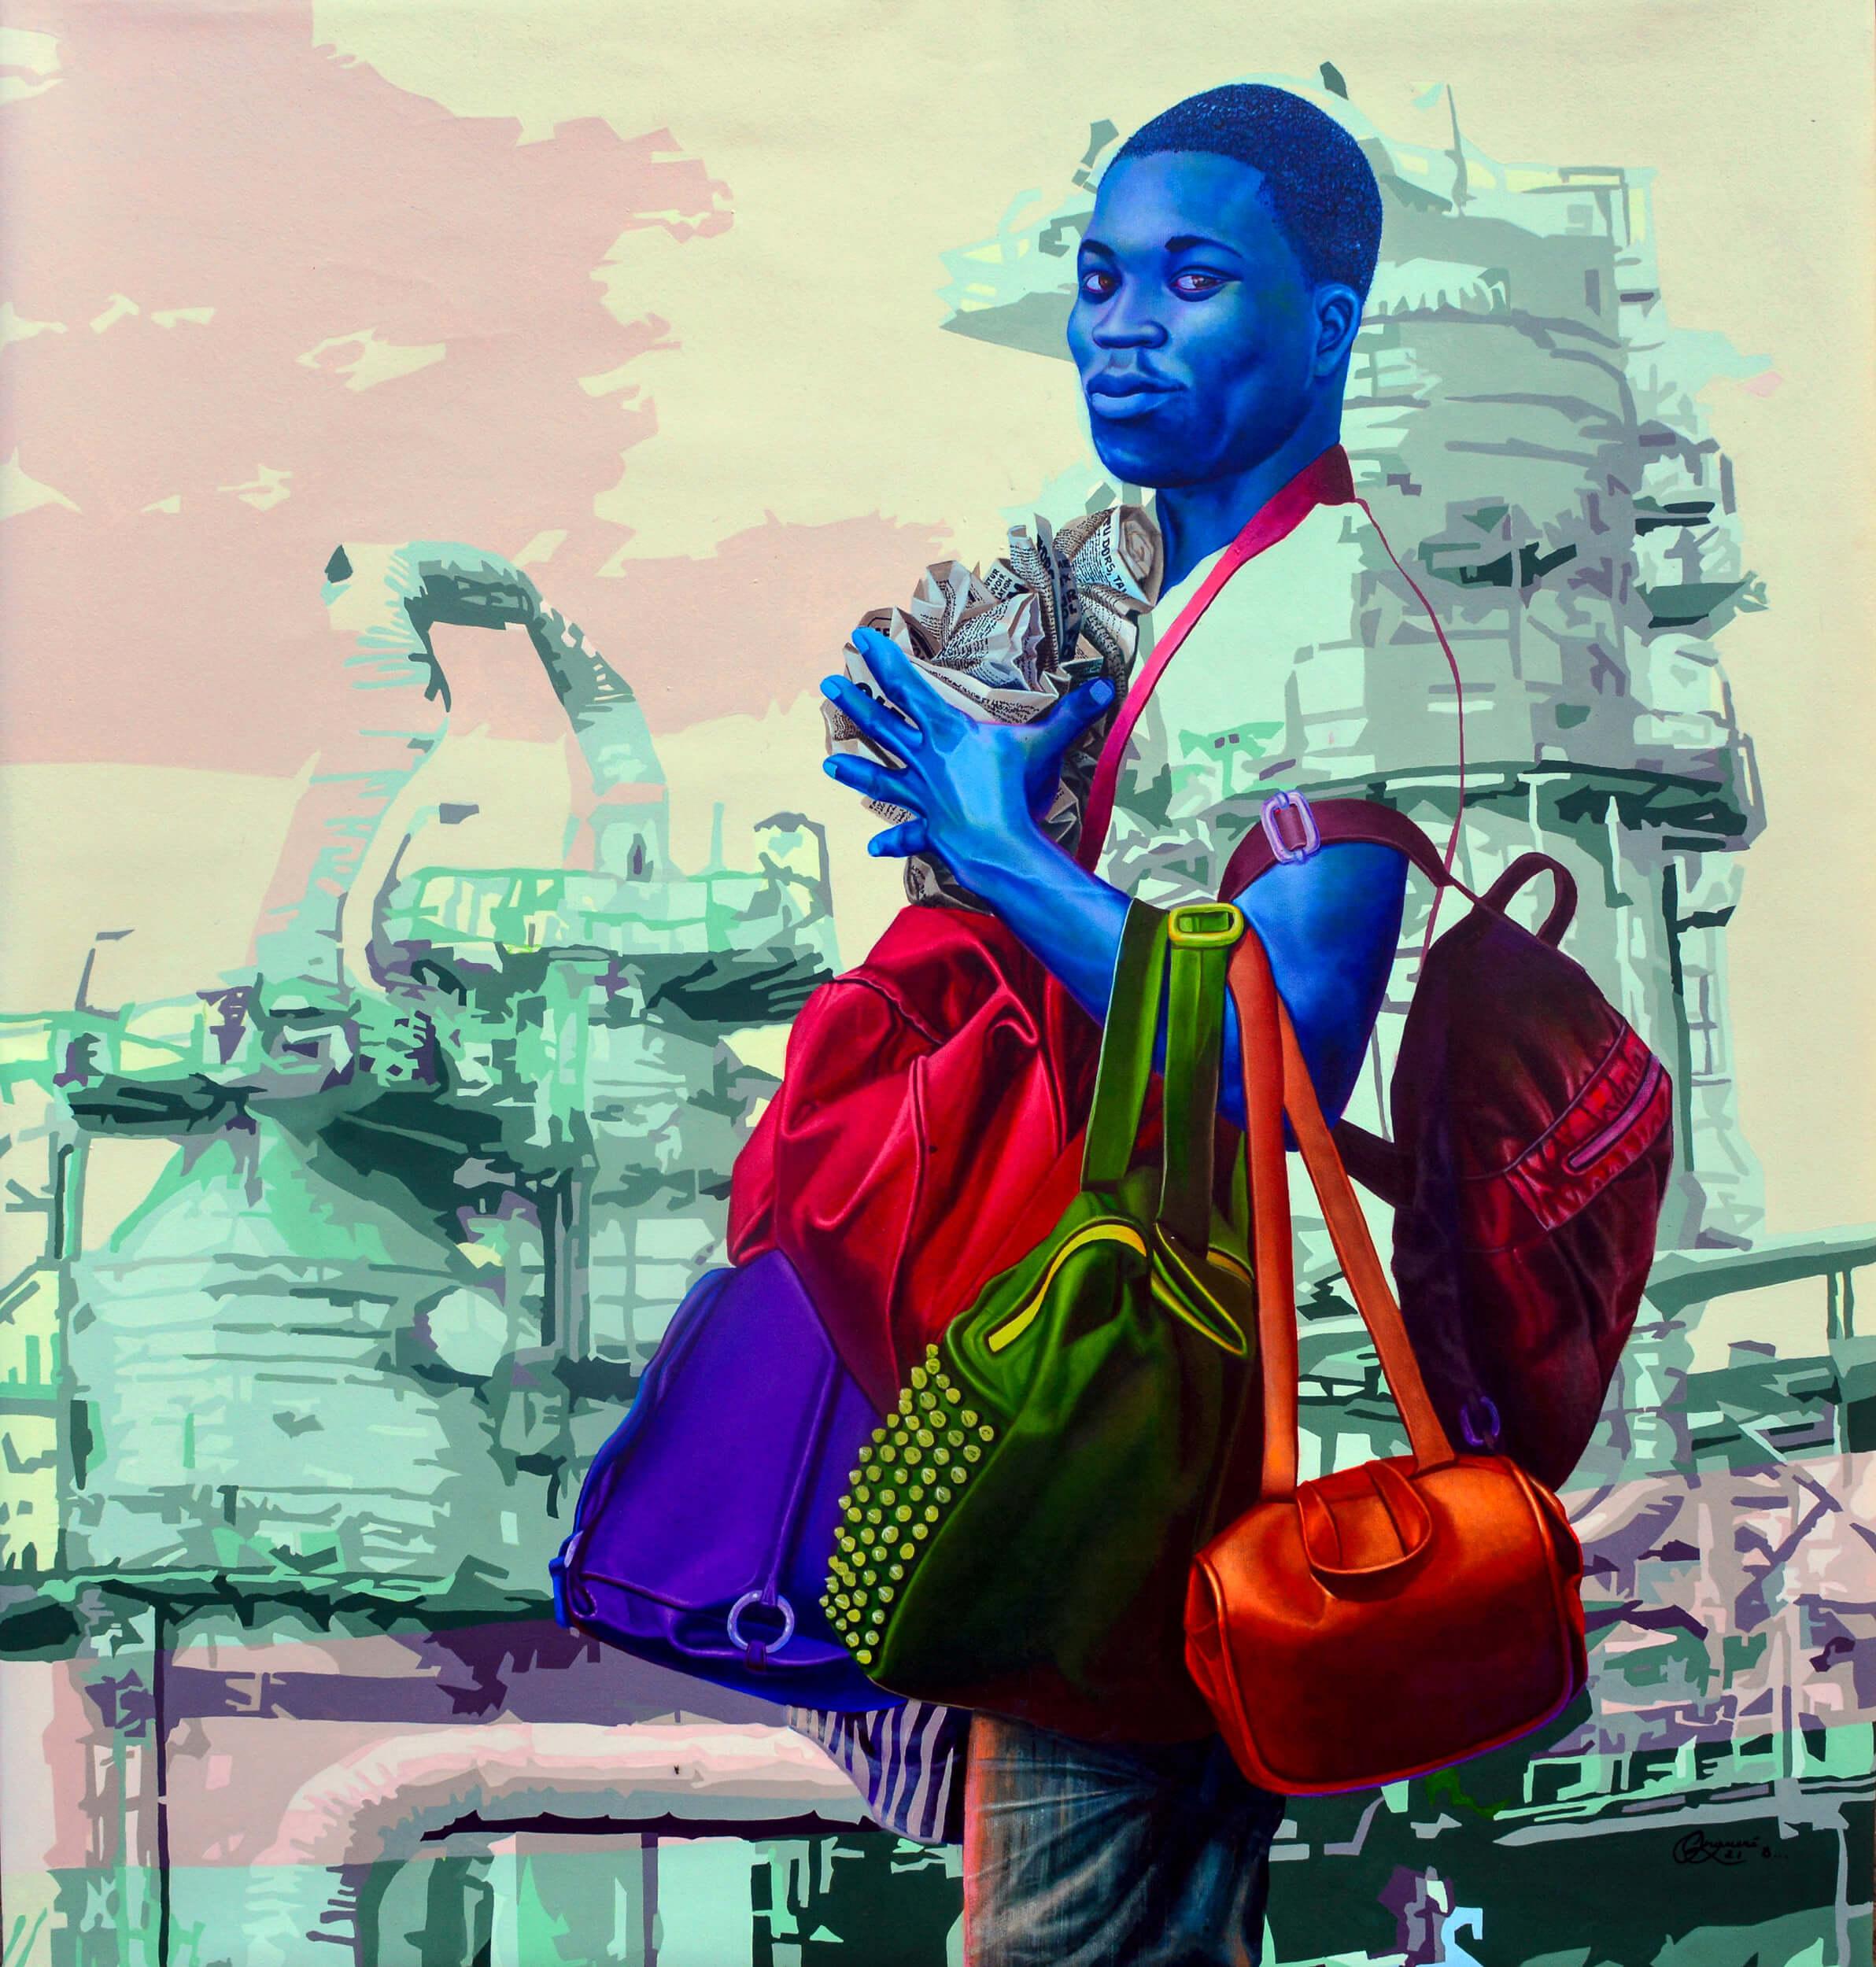 artsy-Daniel Onguene - The brave and the white elephant - 2021 - 120cm H x 110cm W - Acrylic on canvas -2105